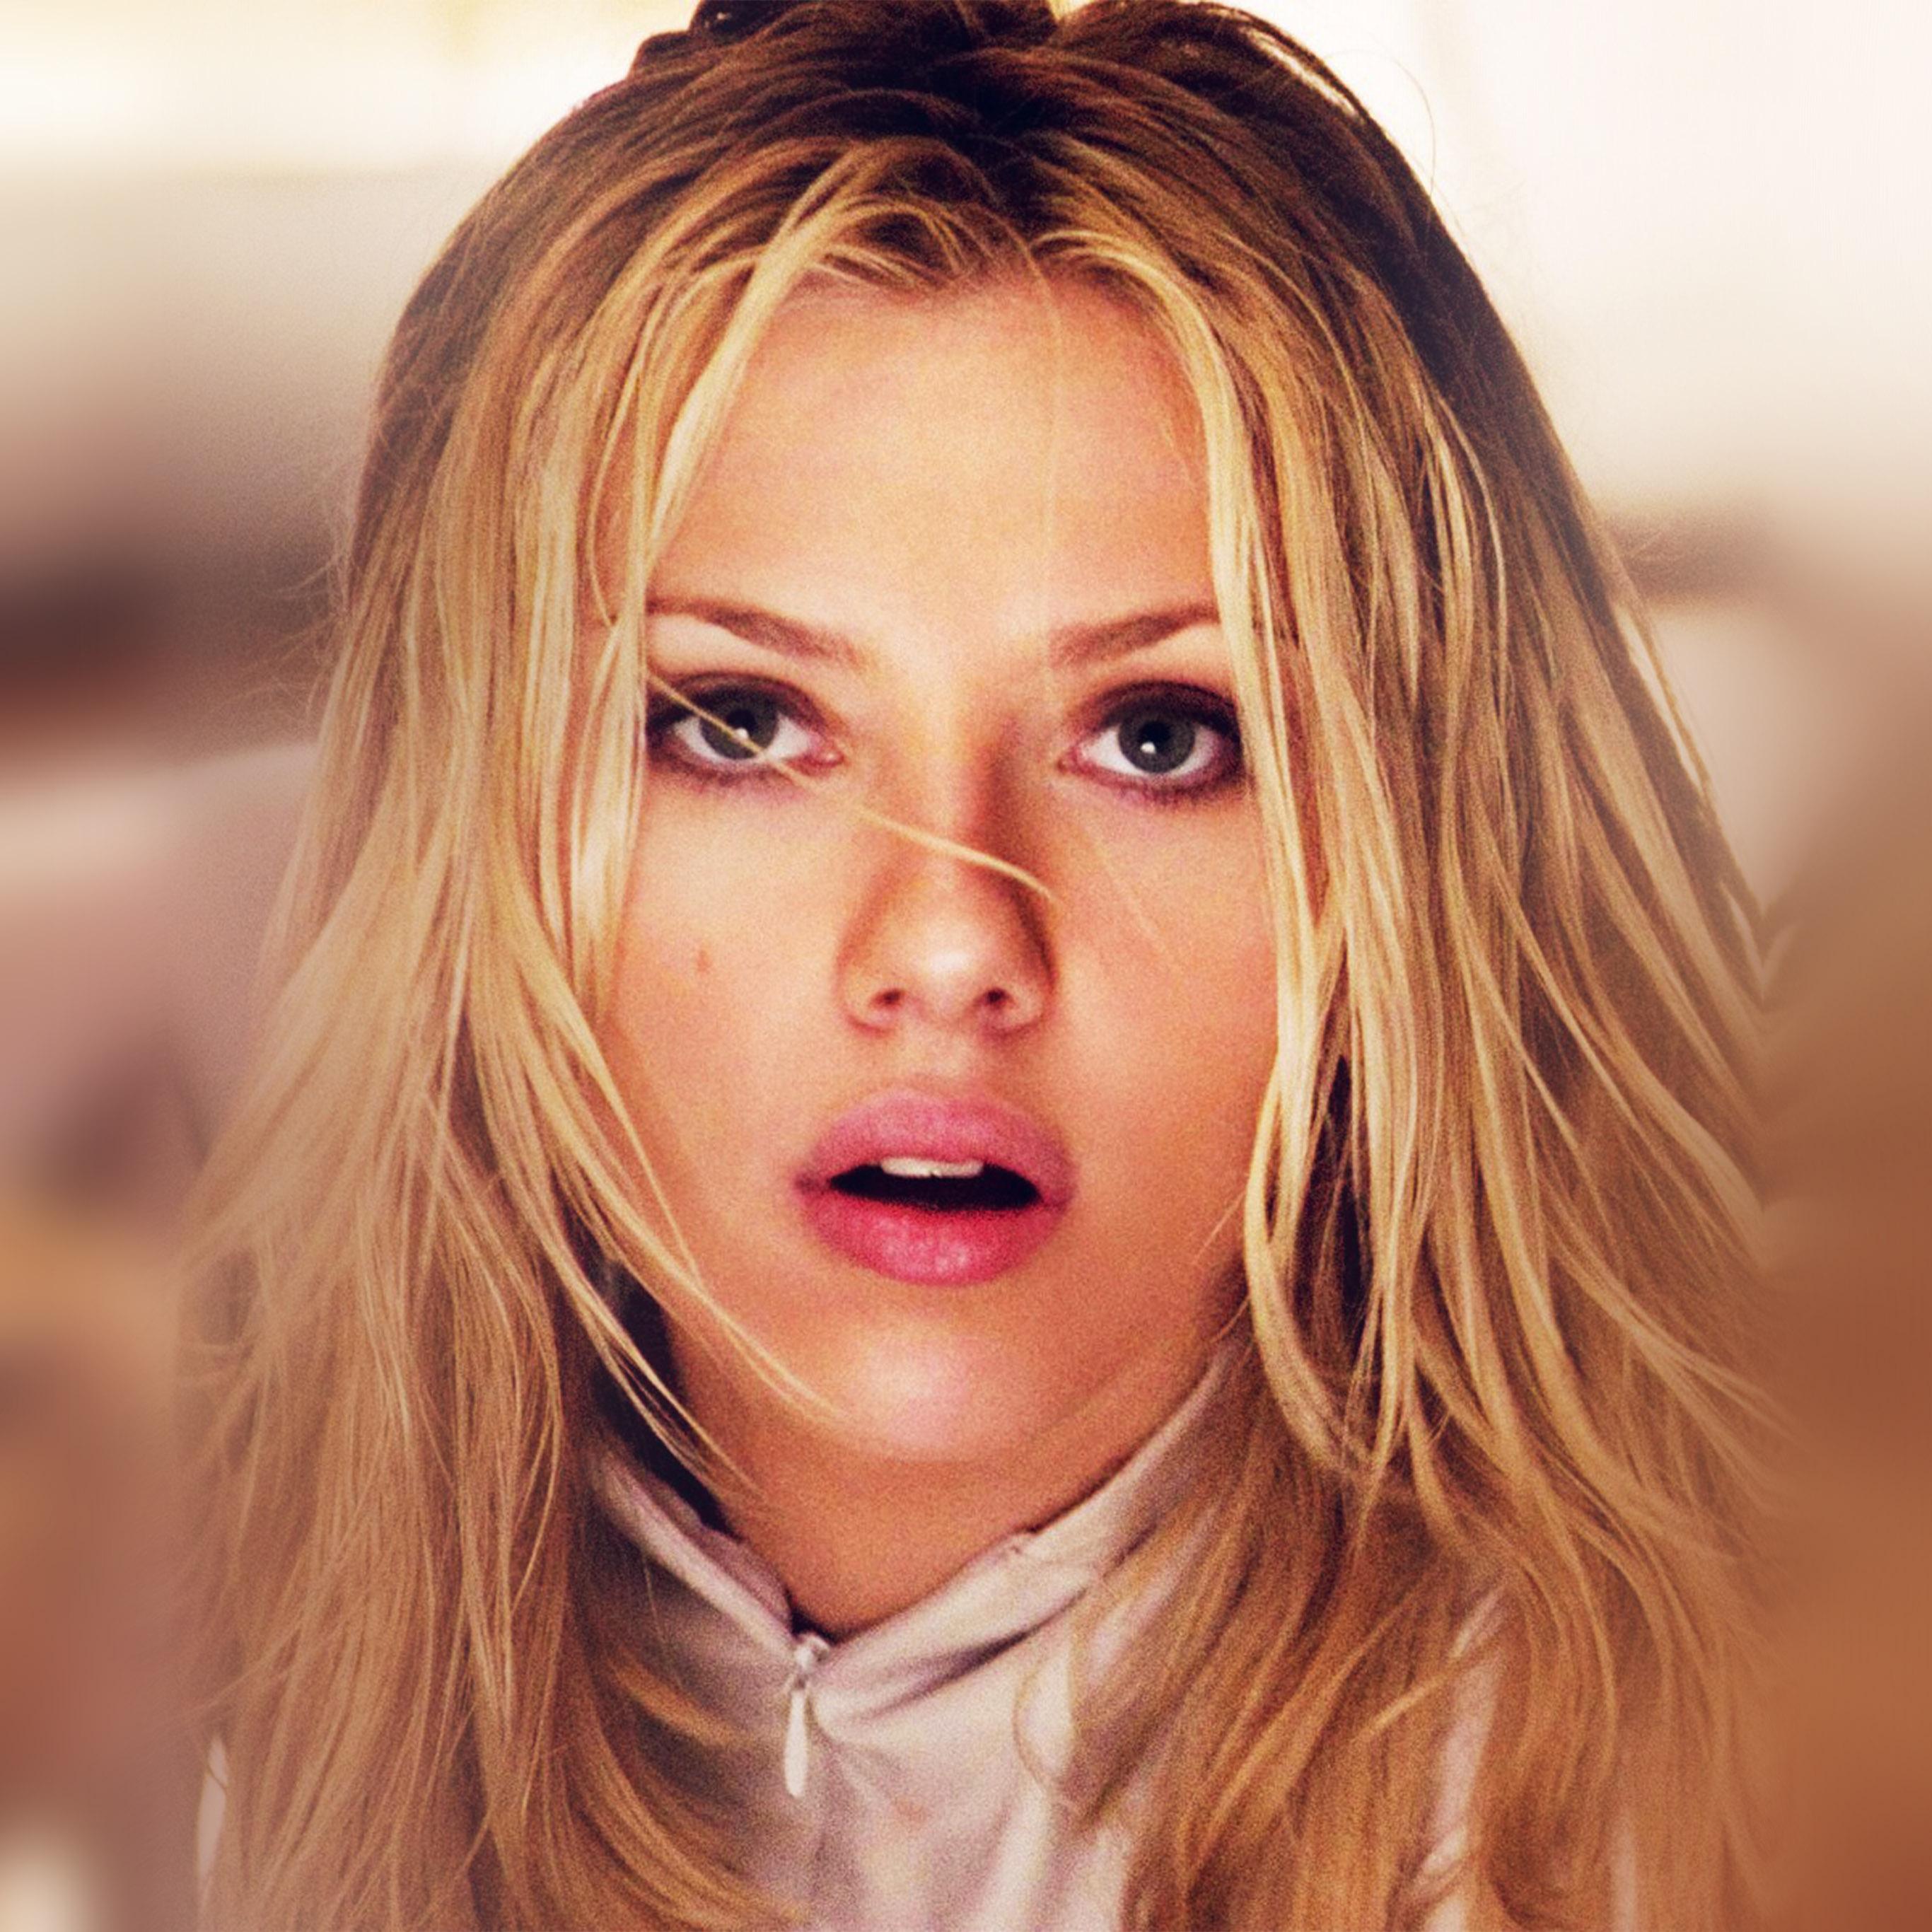 hp27-girl-scarlett-johansson-actress-face-film-wallpaper